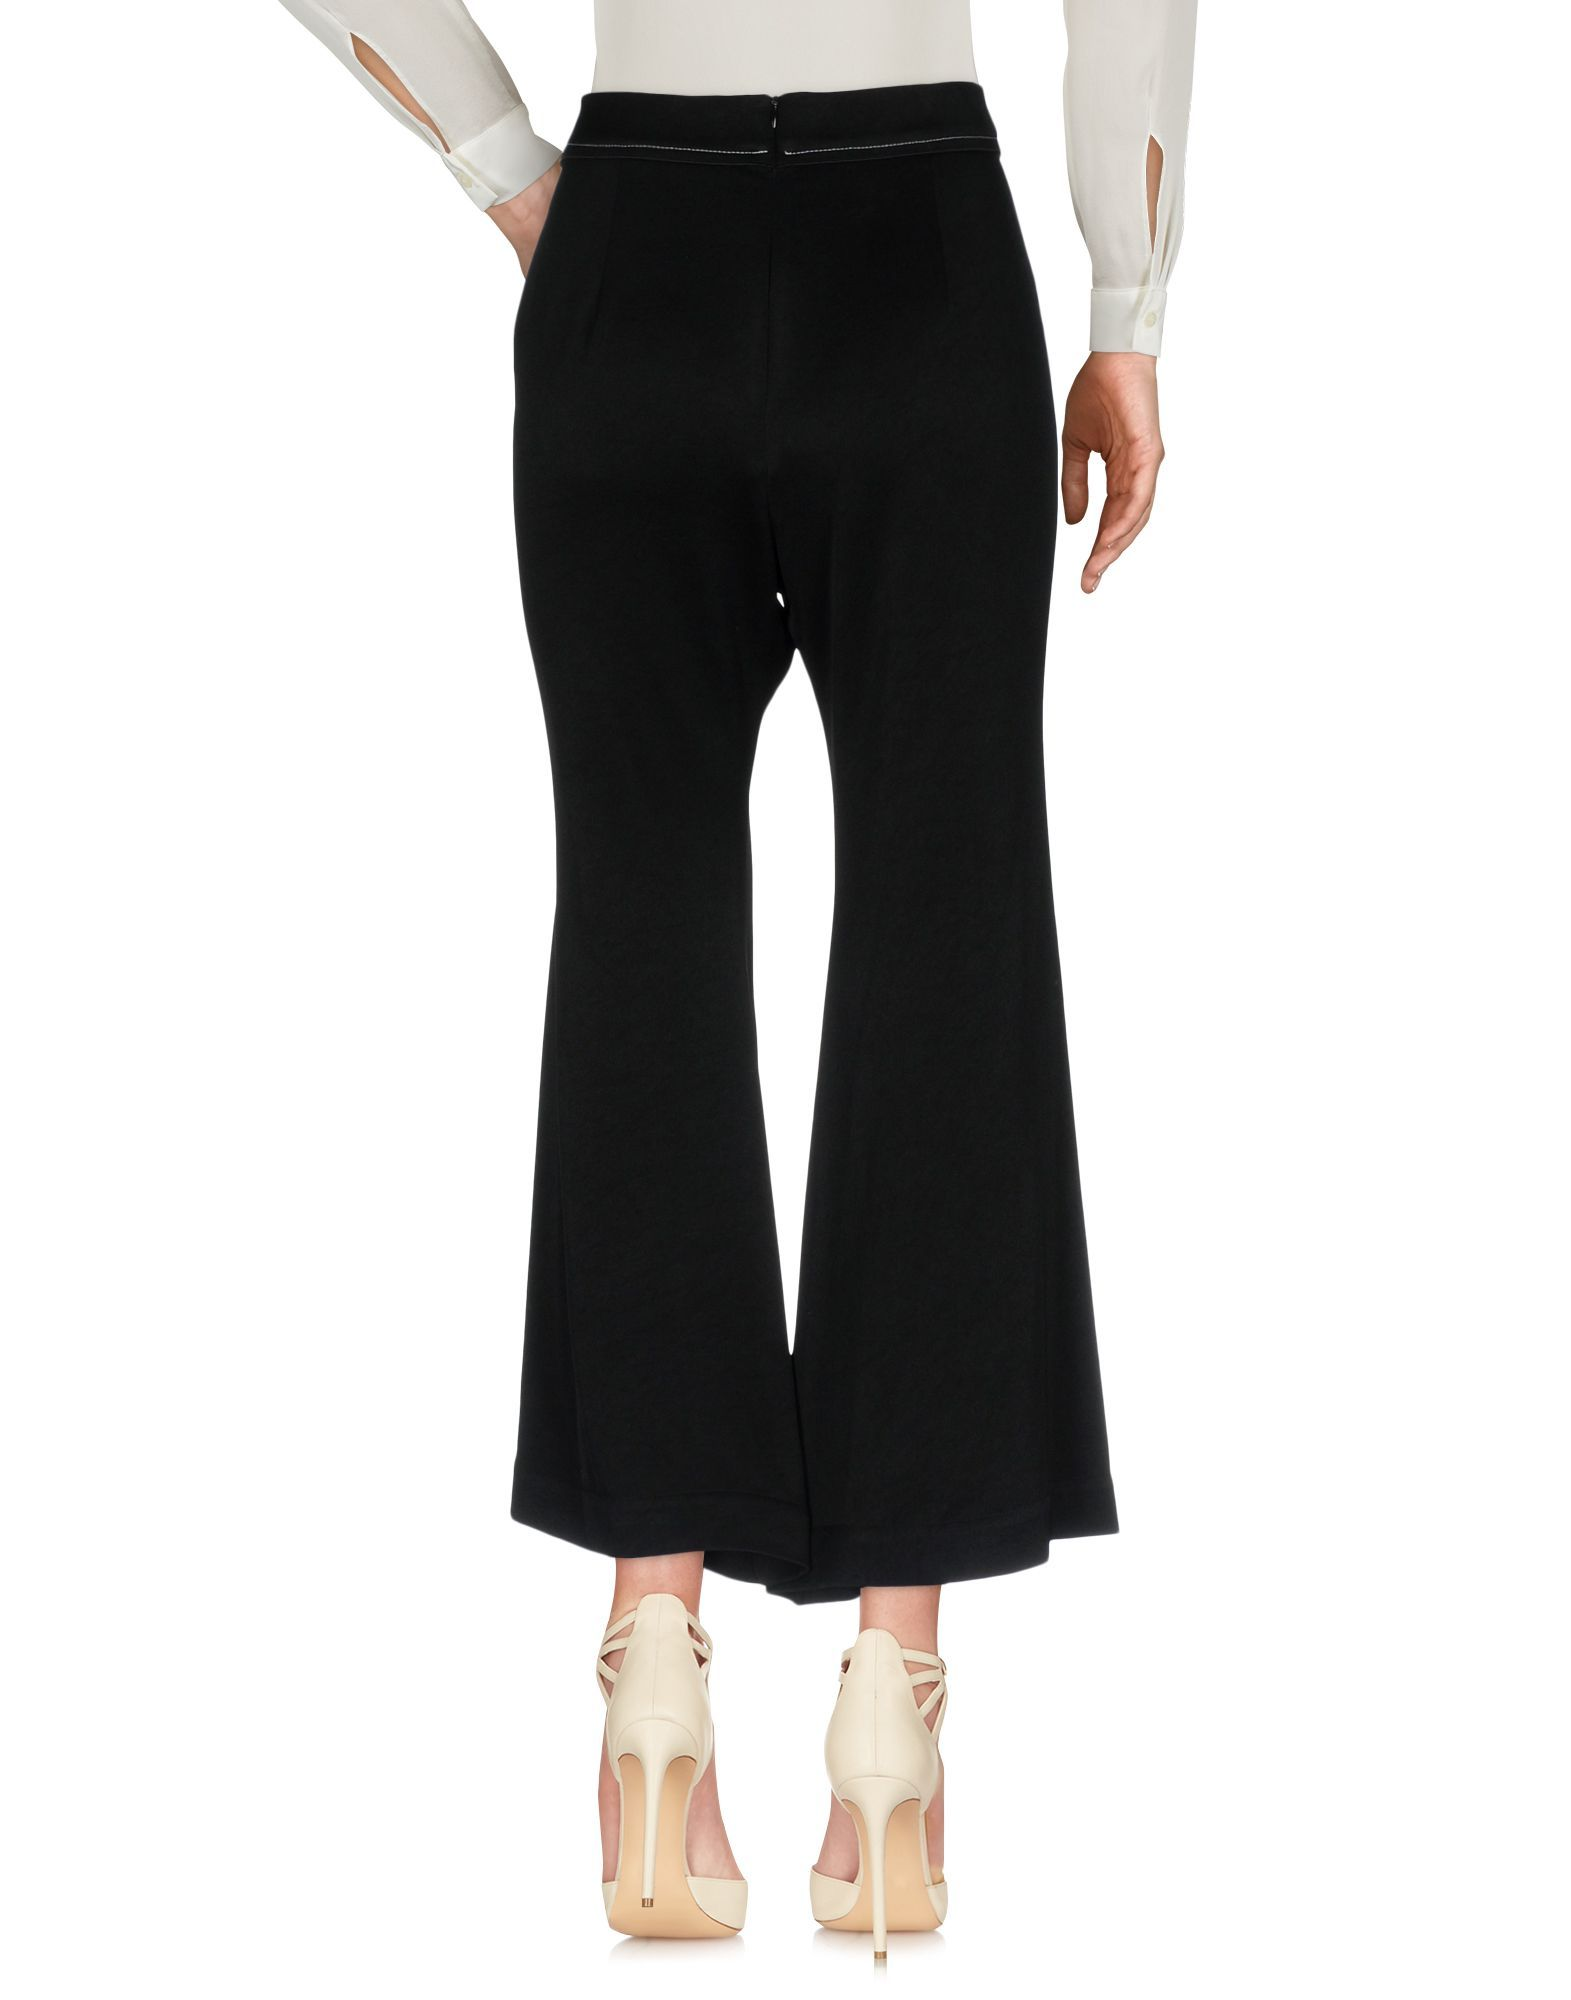 Ellery Black Casual Trousers